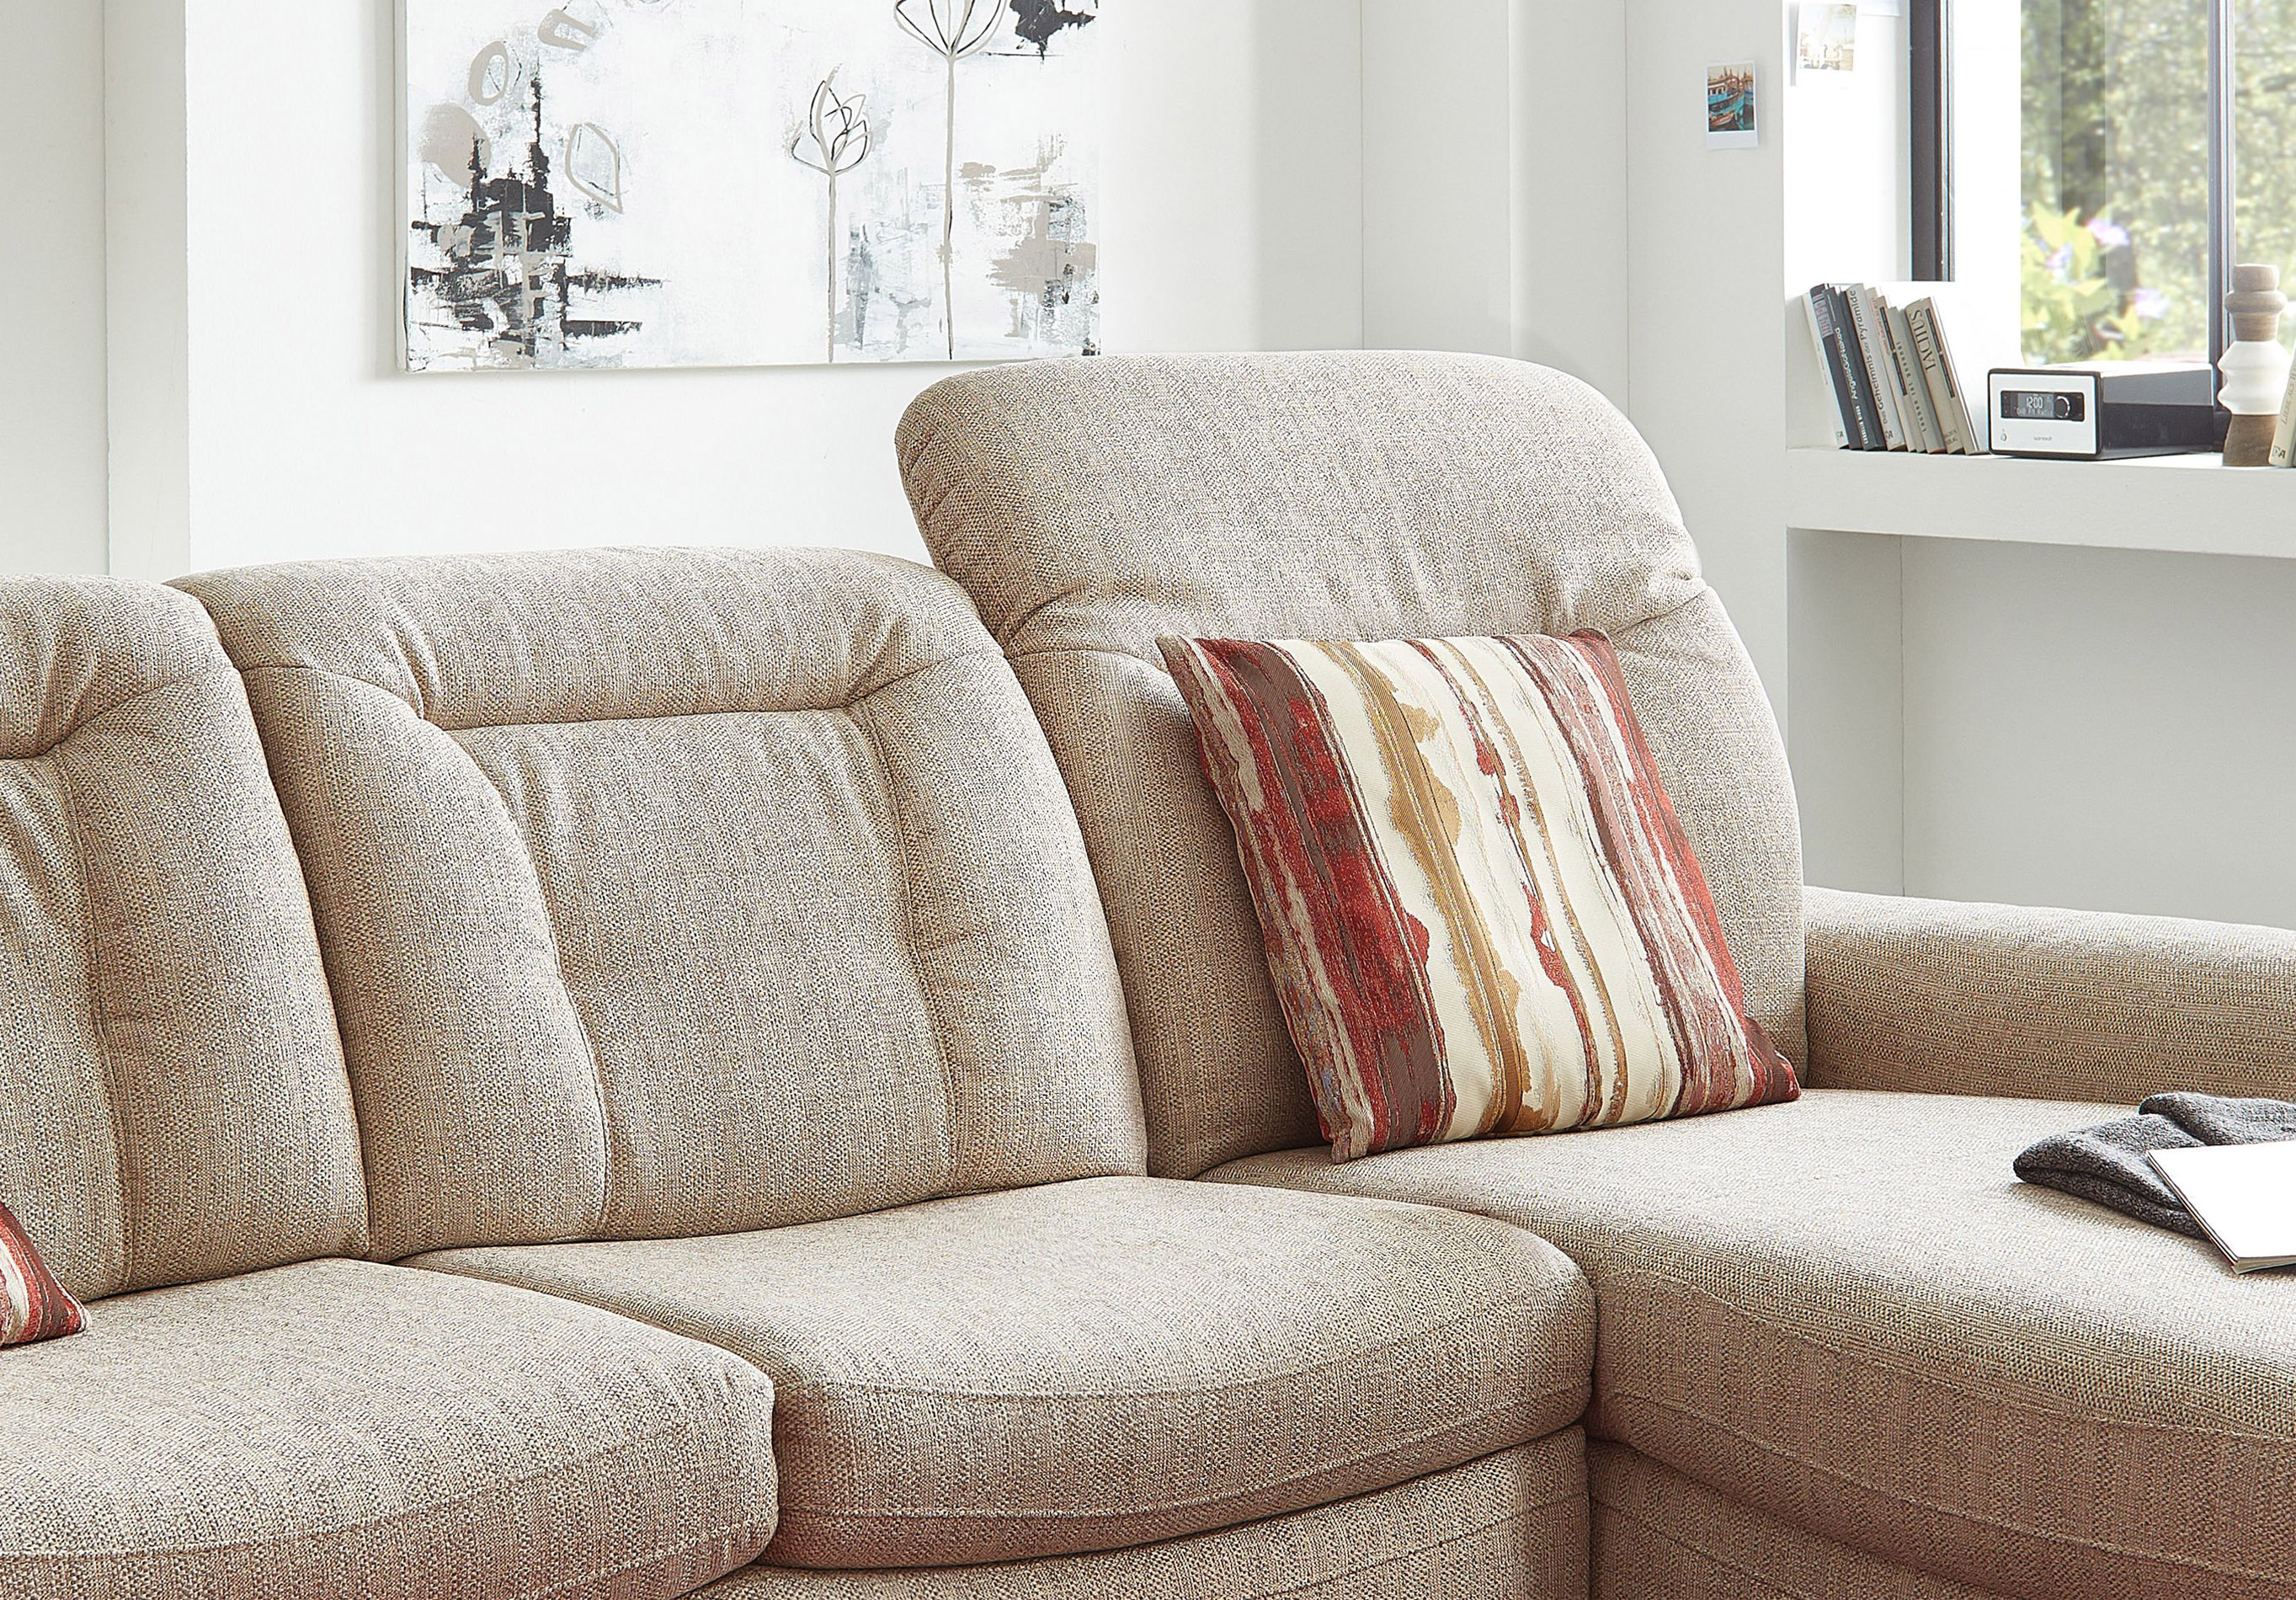 pm oelsa palermo eckgarnitur in beige m bel letz ihr online shop. Black Bedroom Furniture Sets. Home Design Ideas